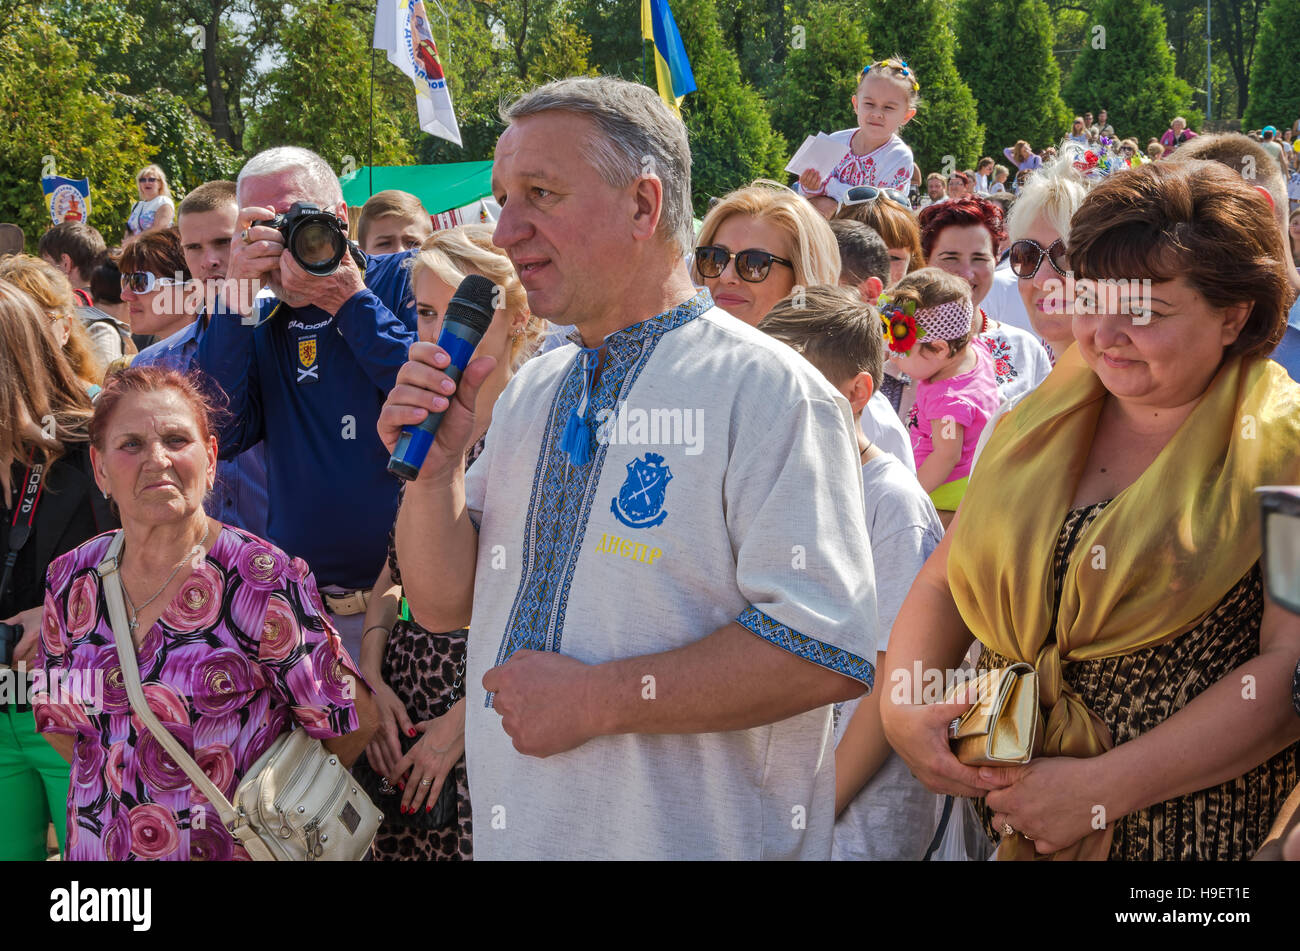 Dnepropetrovsk, Ukraine - September 13, 2014: Dnepropetrovsk Mayor Ivan Kulichenko congratulates residents on the - Stock Image